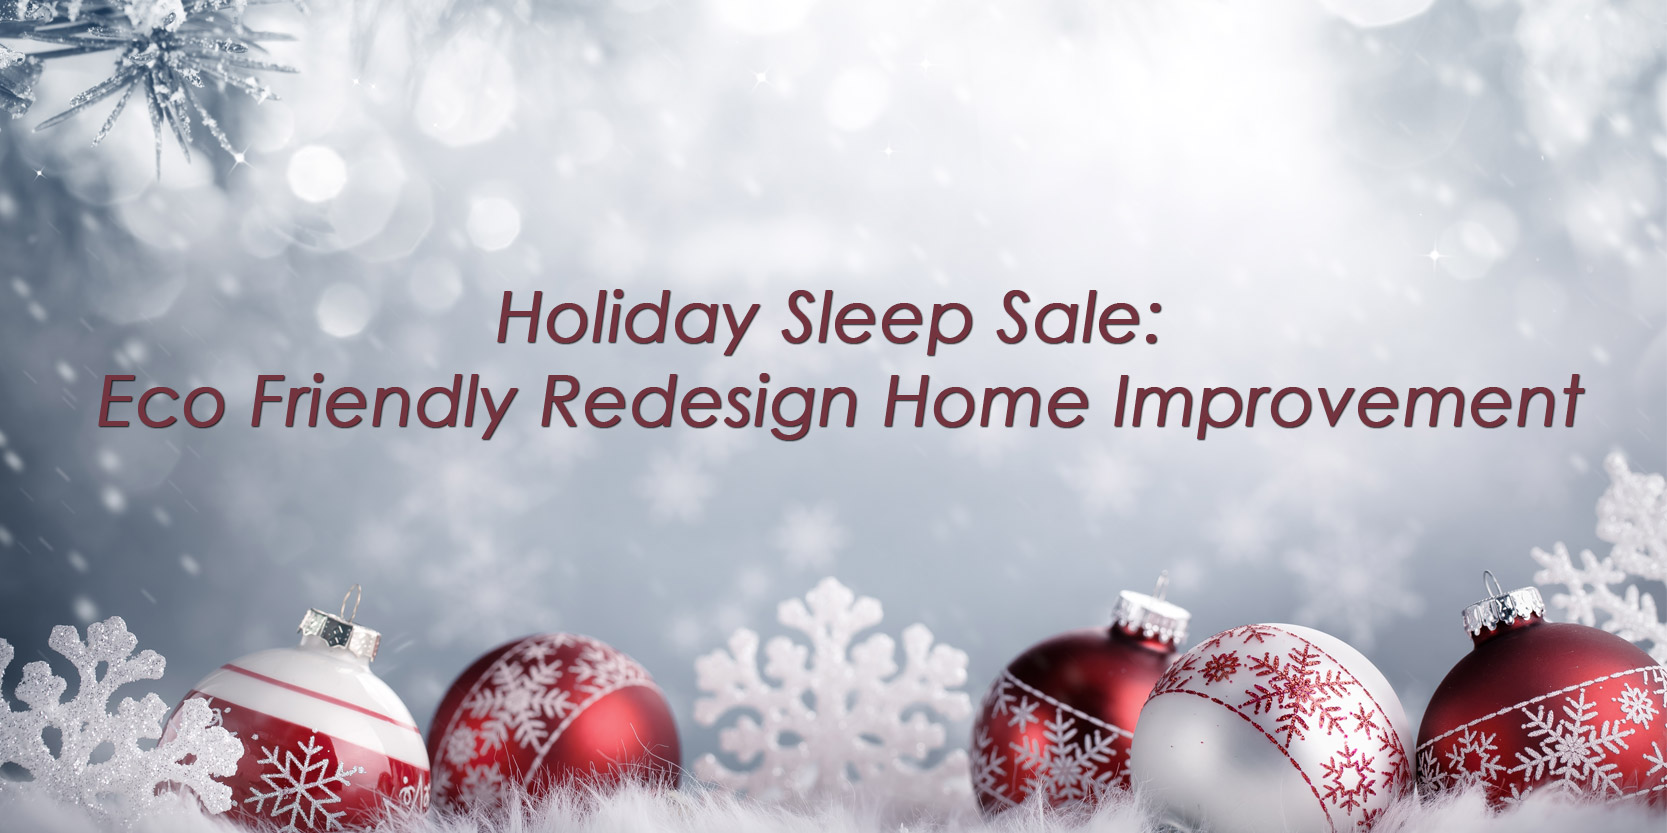 Holiday Sleep sale